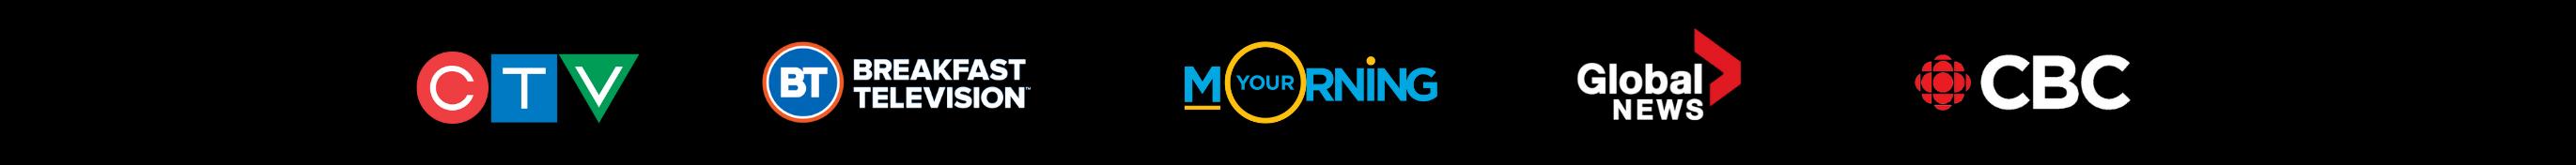 Sam Demma Youth Motivational Speaker